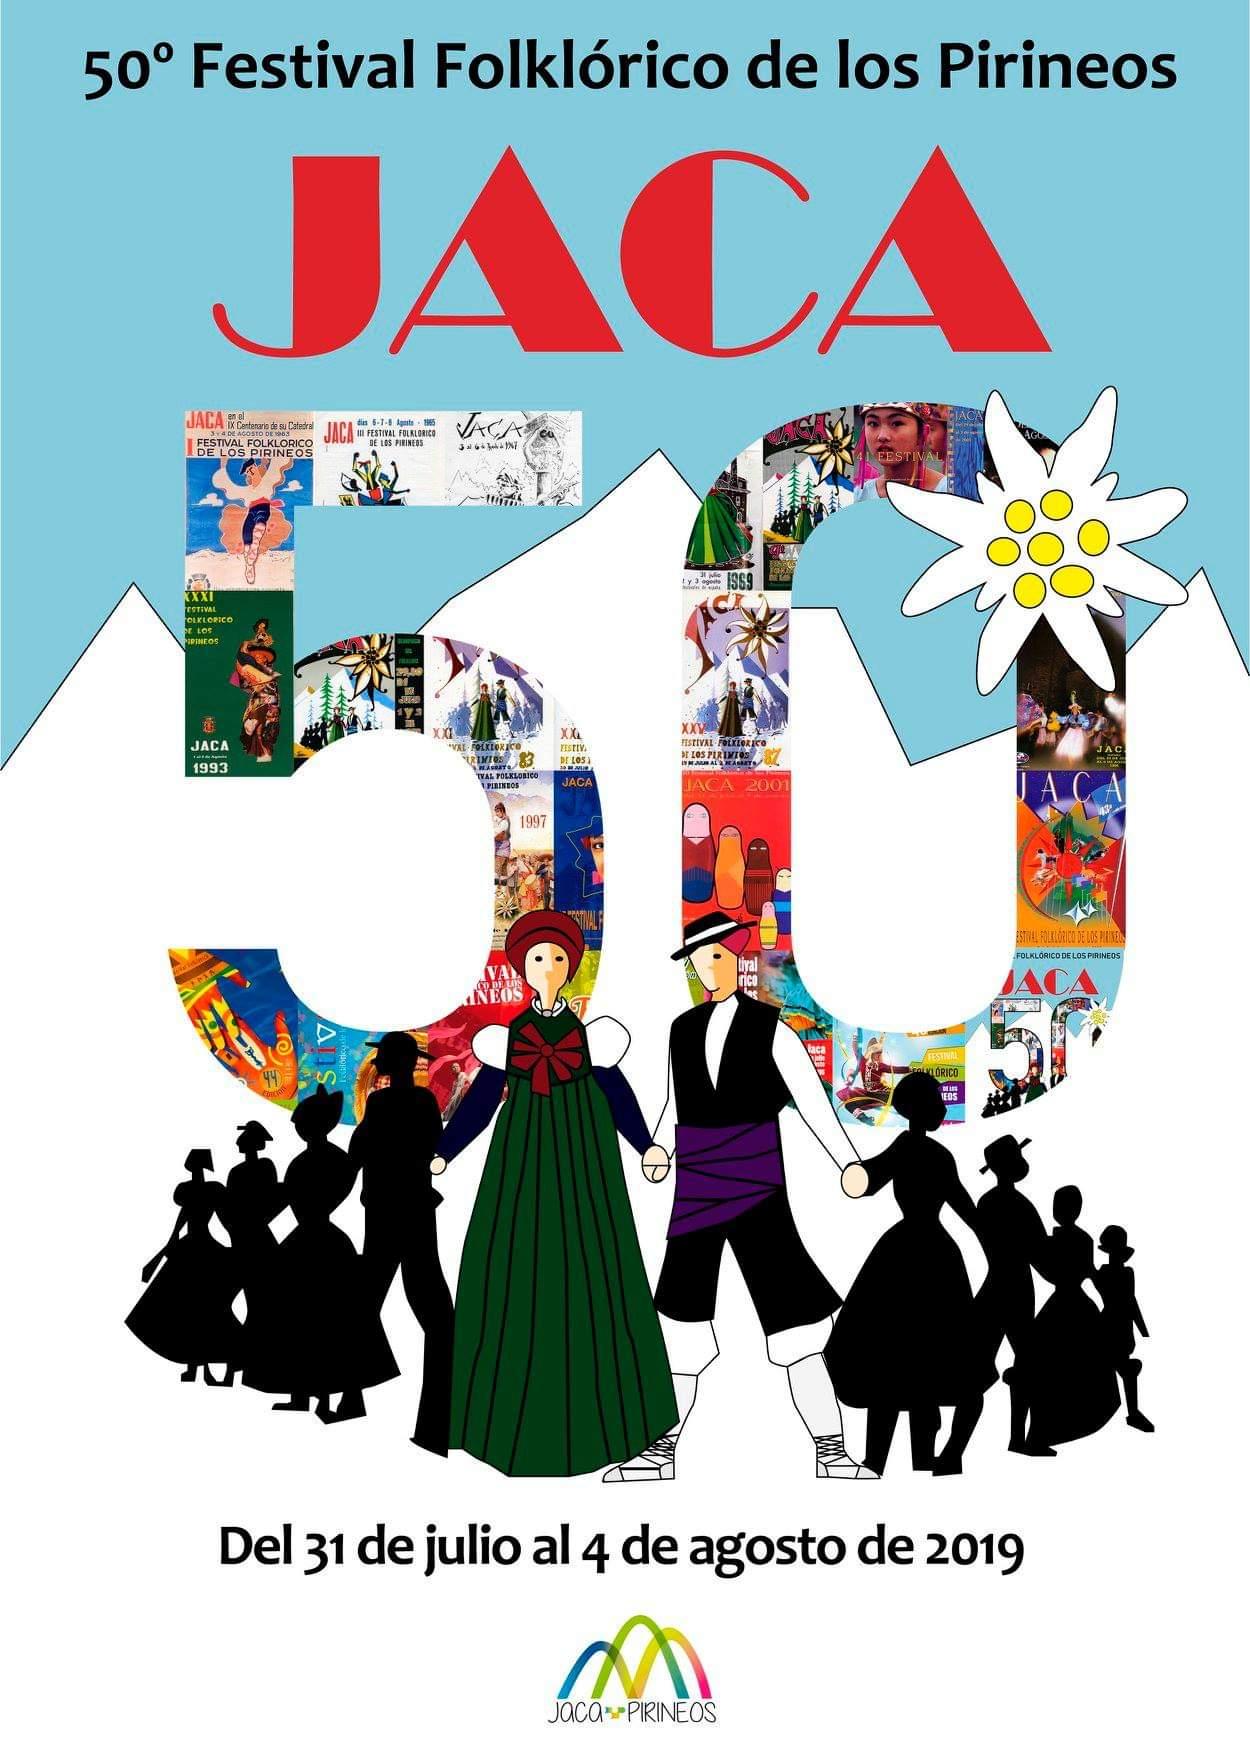 Festival Folklórico de los Pirineos 2017